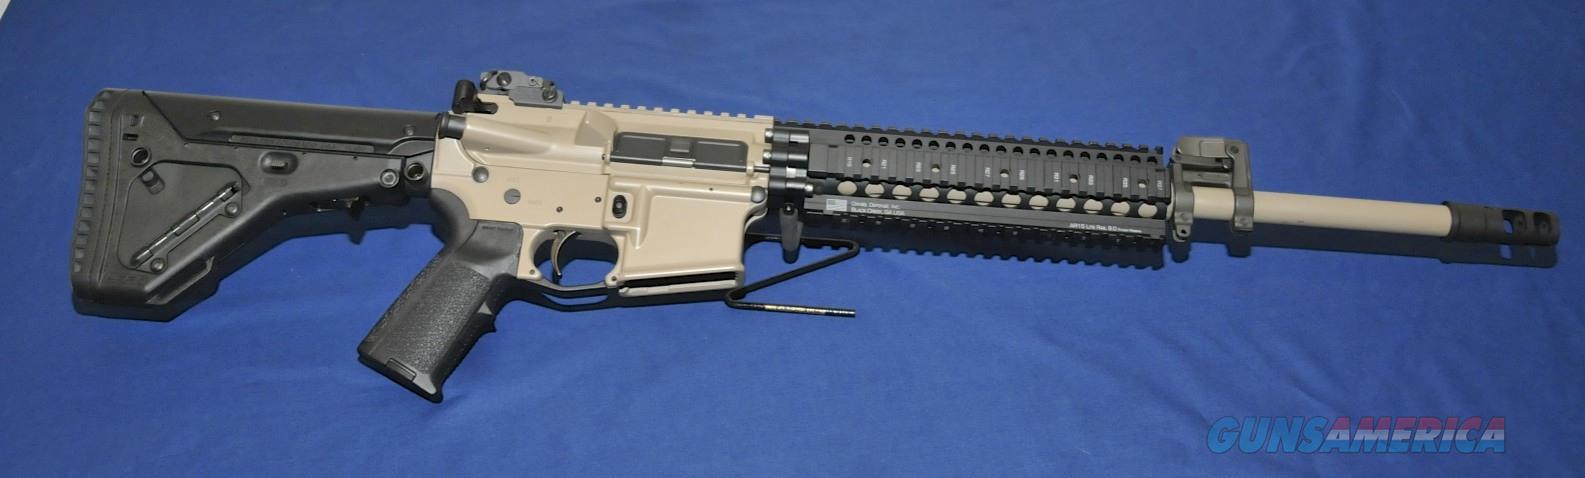 Bushmaster Custom Shop PSR Perimeter Security Rifle  Guns > Rifles > Bushmaster Rifles > Complete Rifles